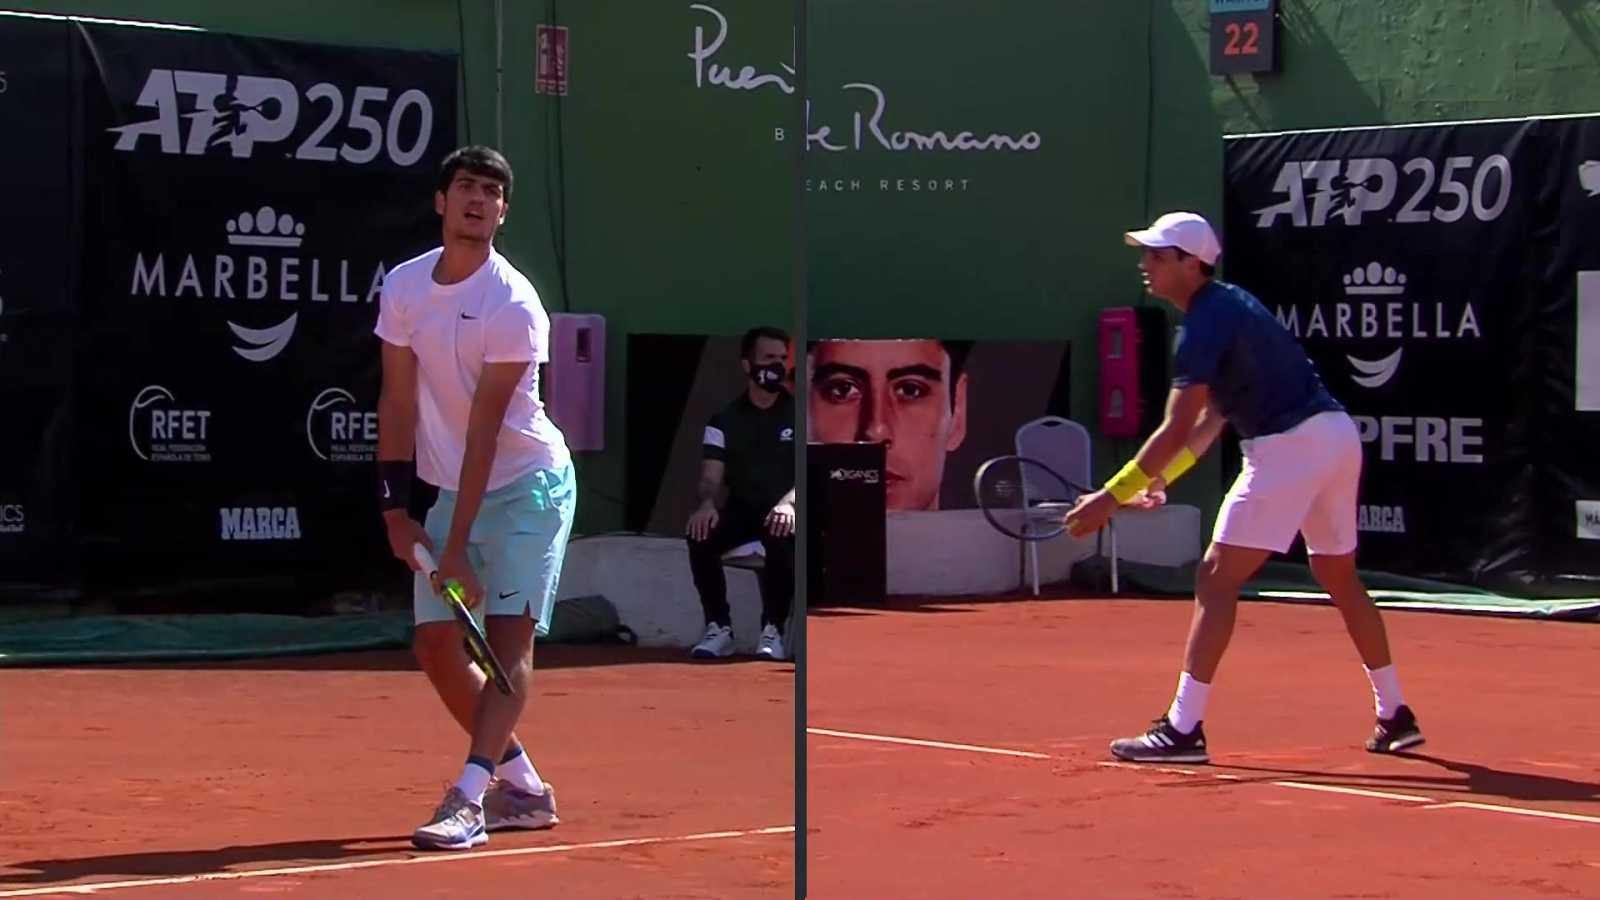 Tenis - ATP 250 Torneo Marbella, 2ª semifinal: Carlos Alcaraz - Jaume Munar - ver ahora